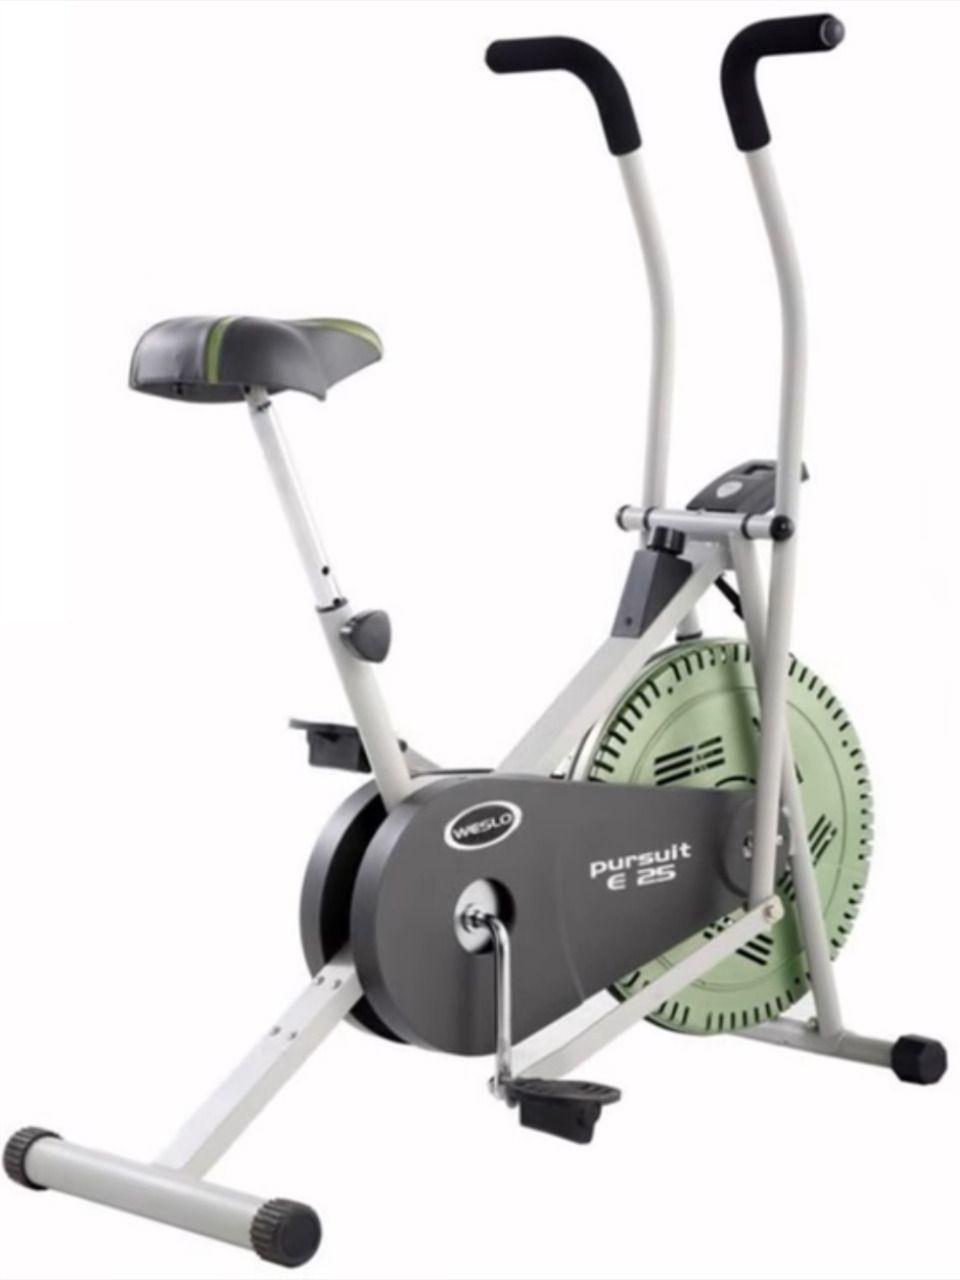 Portable Eliptical Machine Mini Exercise Bike Biking Workout Workout Machines